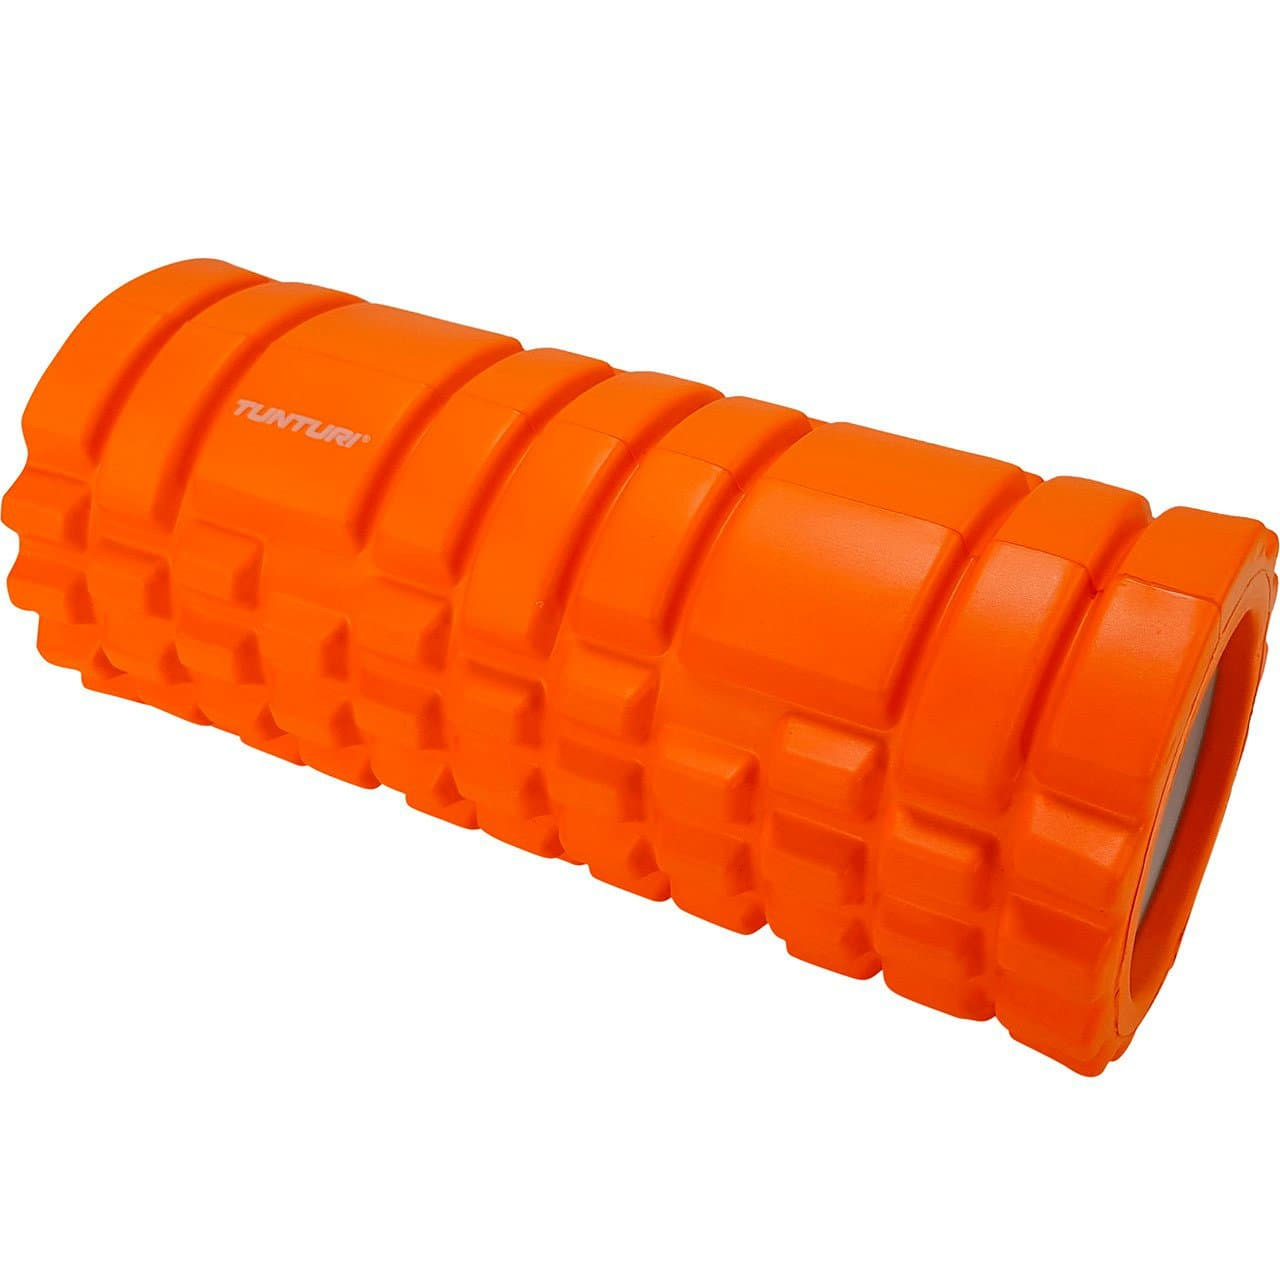 Tunturi Rouleau de massage yoga orange à bloc de mousse, 33 cm